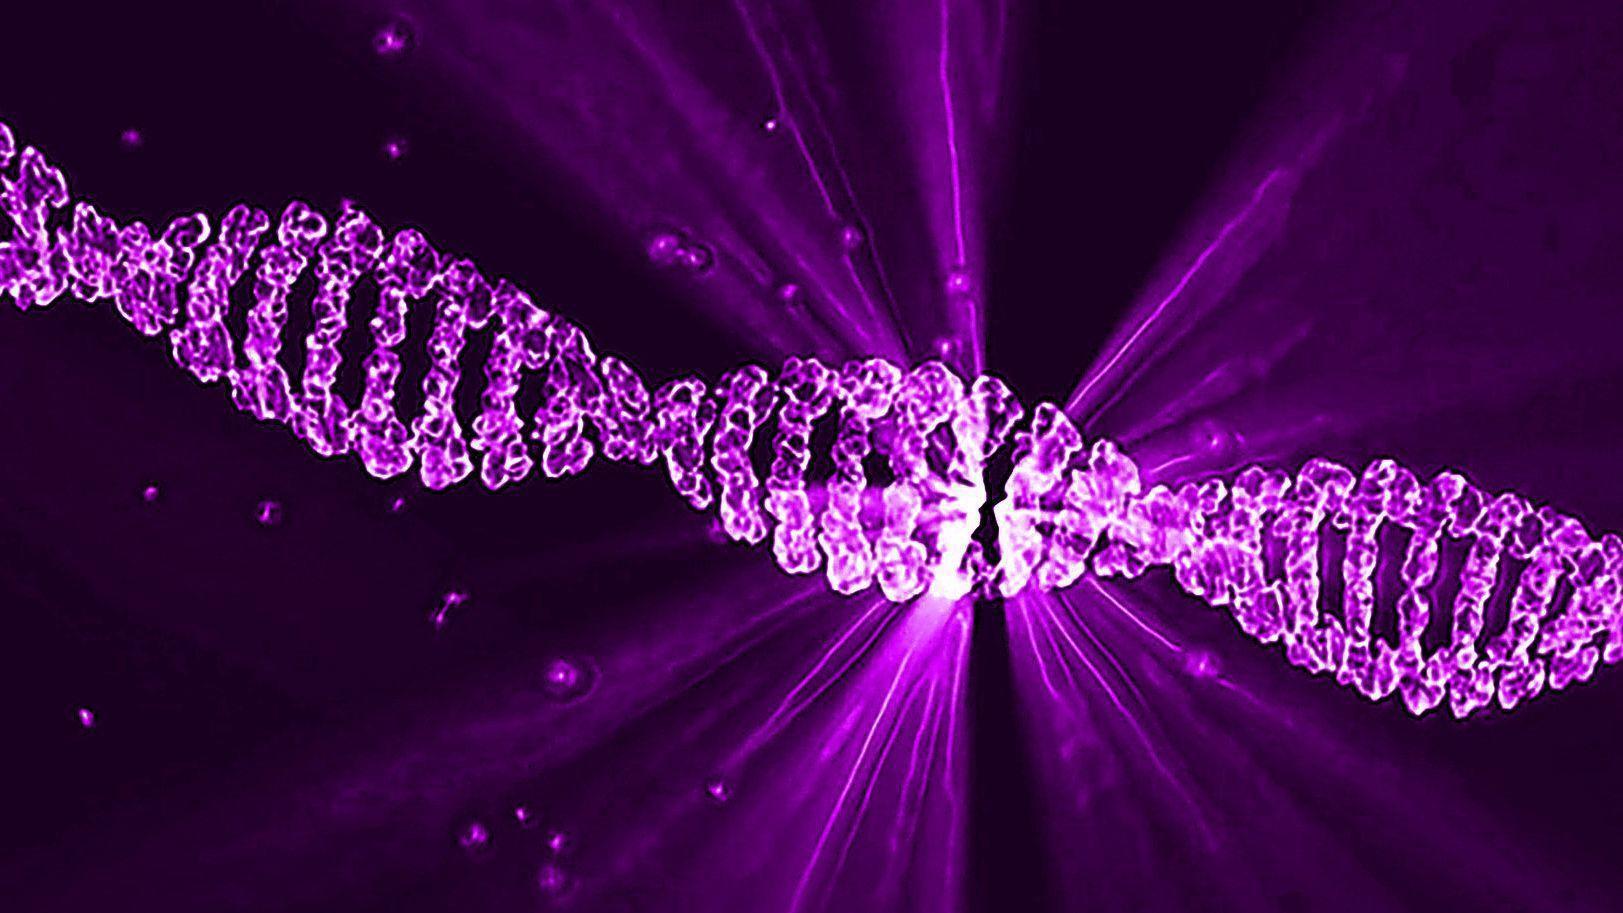 singlera genomics raises 60 million for early stage cancer tests orlando sentinel. Black Bedroom Furniture Sets. Home Design Ideas